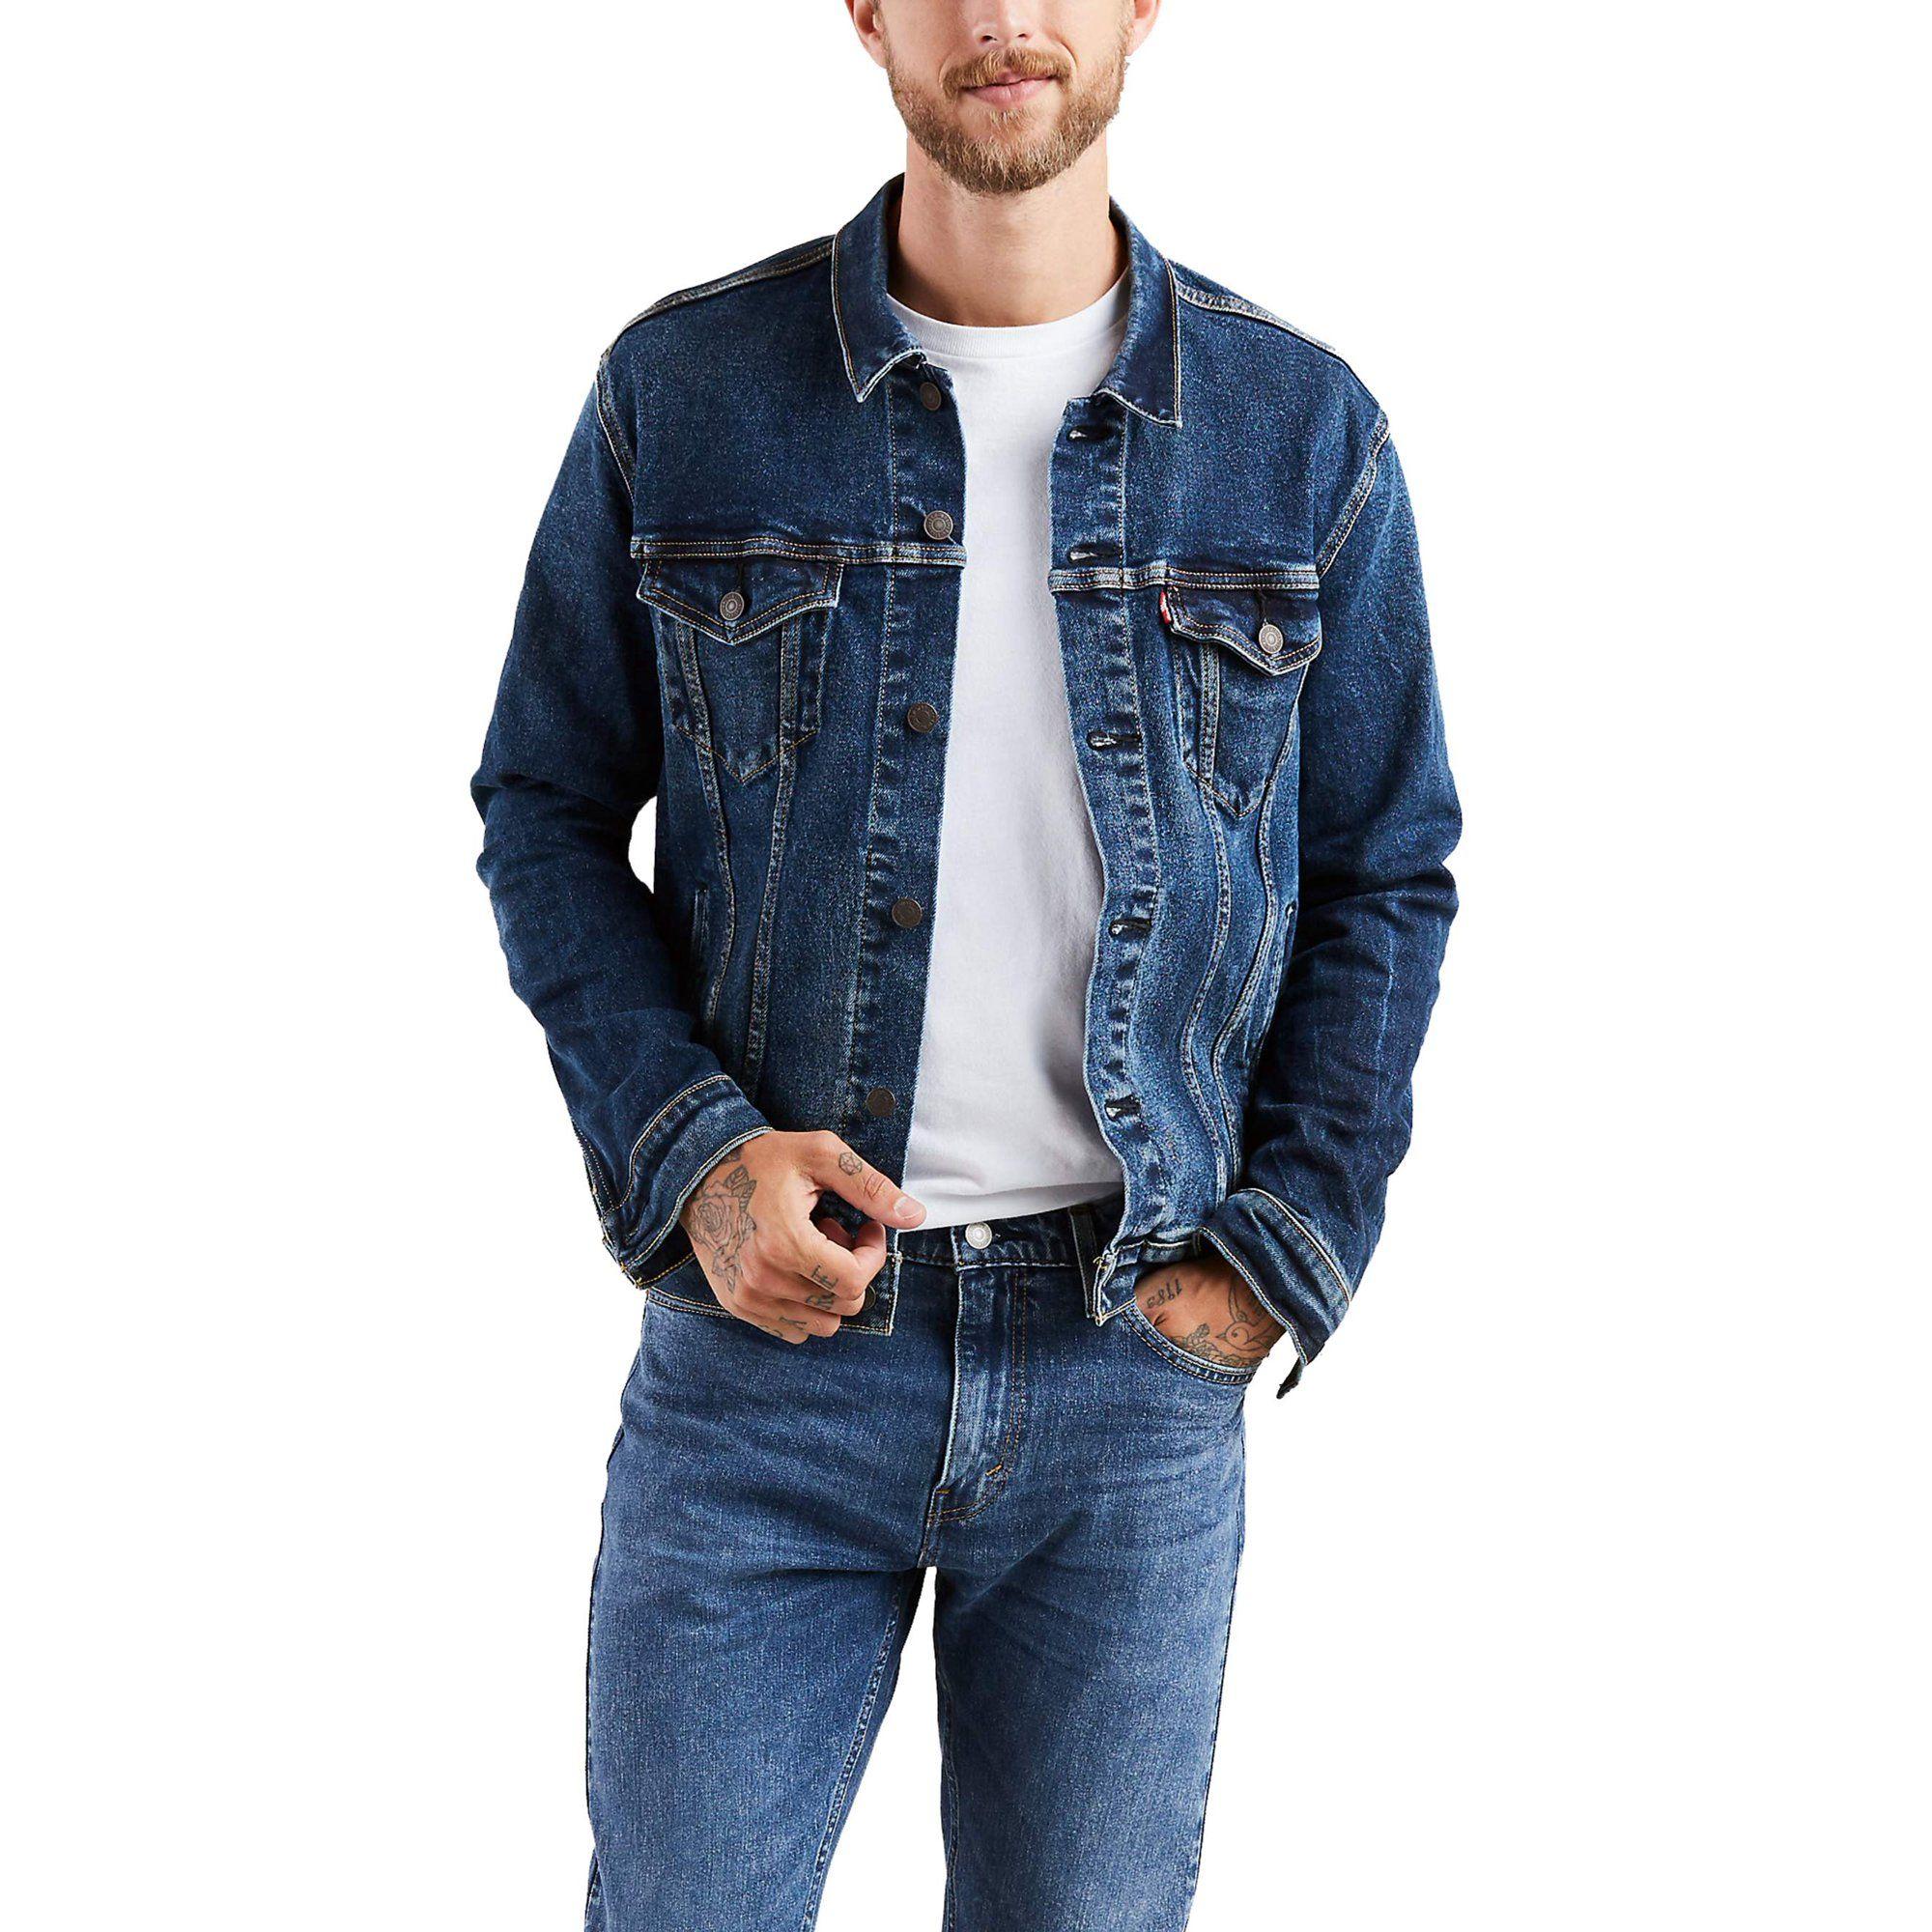 Levi S Levi S Men S Denim Trucker Jacket Walmart Com Tall Men Clothing Denim Jacket Mens Outfits [ 2000 x 2000 Pixel ]